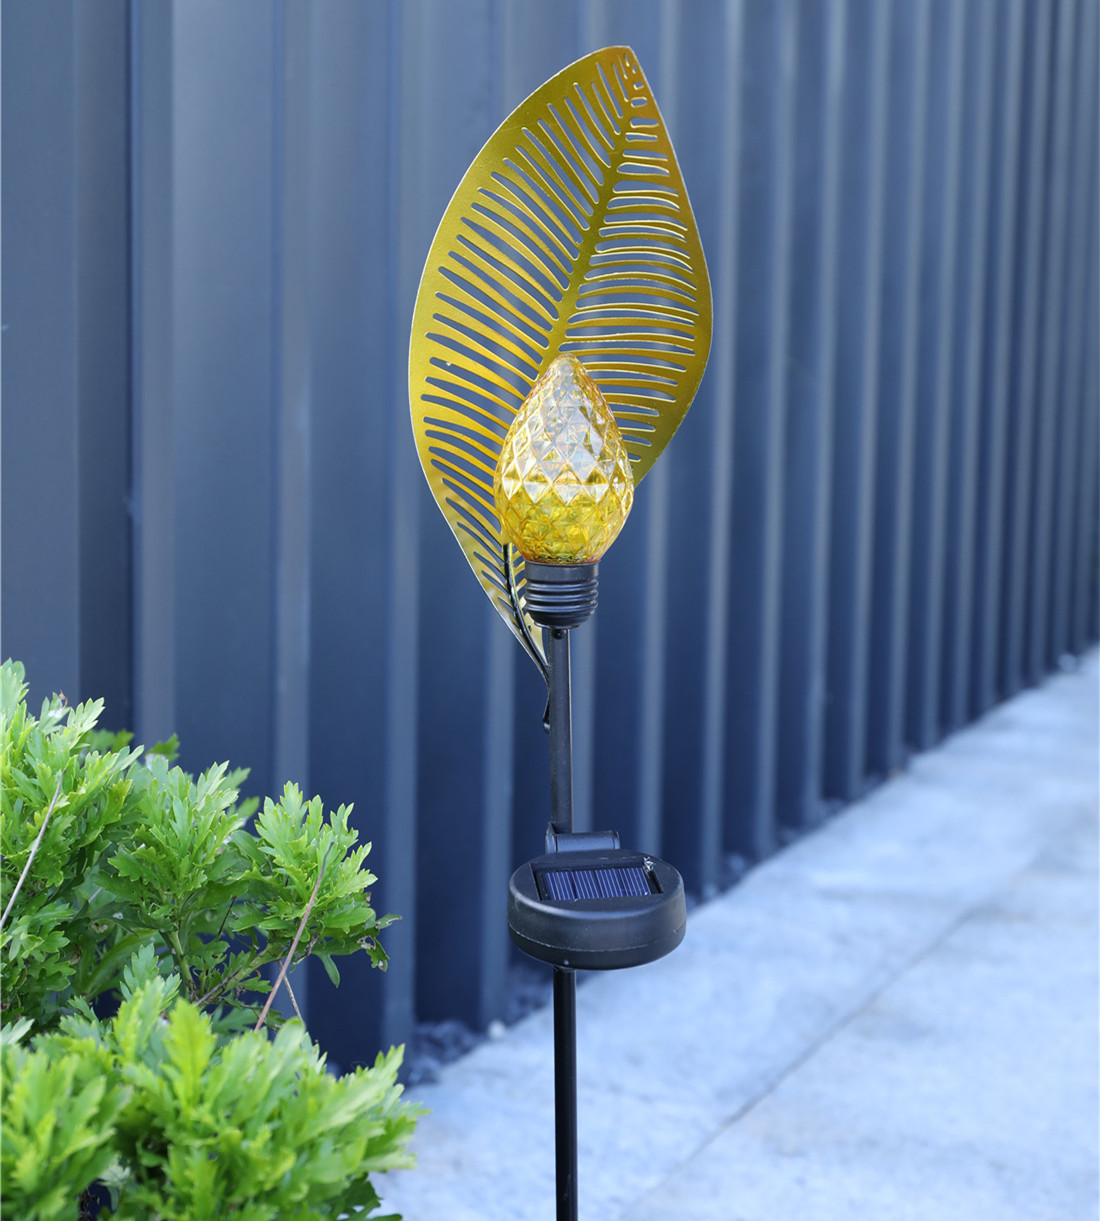 LED Solar Powered Waterproof Light Leaf Shape Outdoor Garden Decor Landscape Lawn Lamp warm light_Solar Leaf